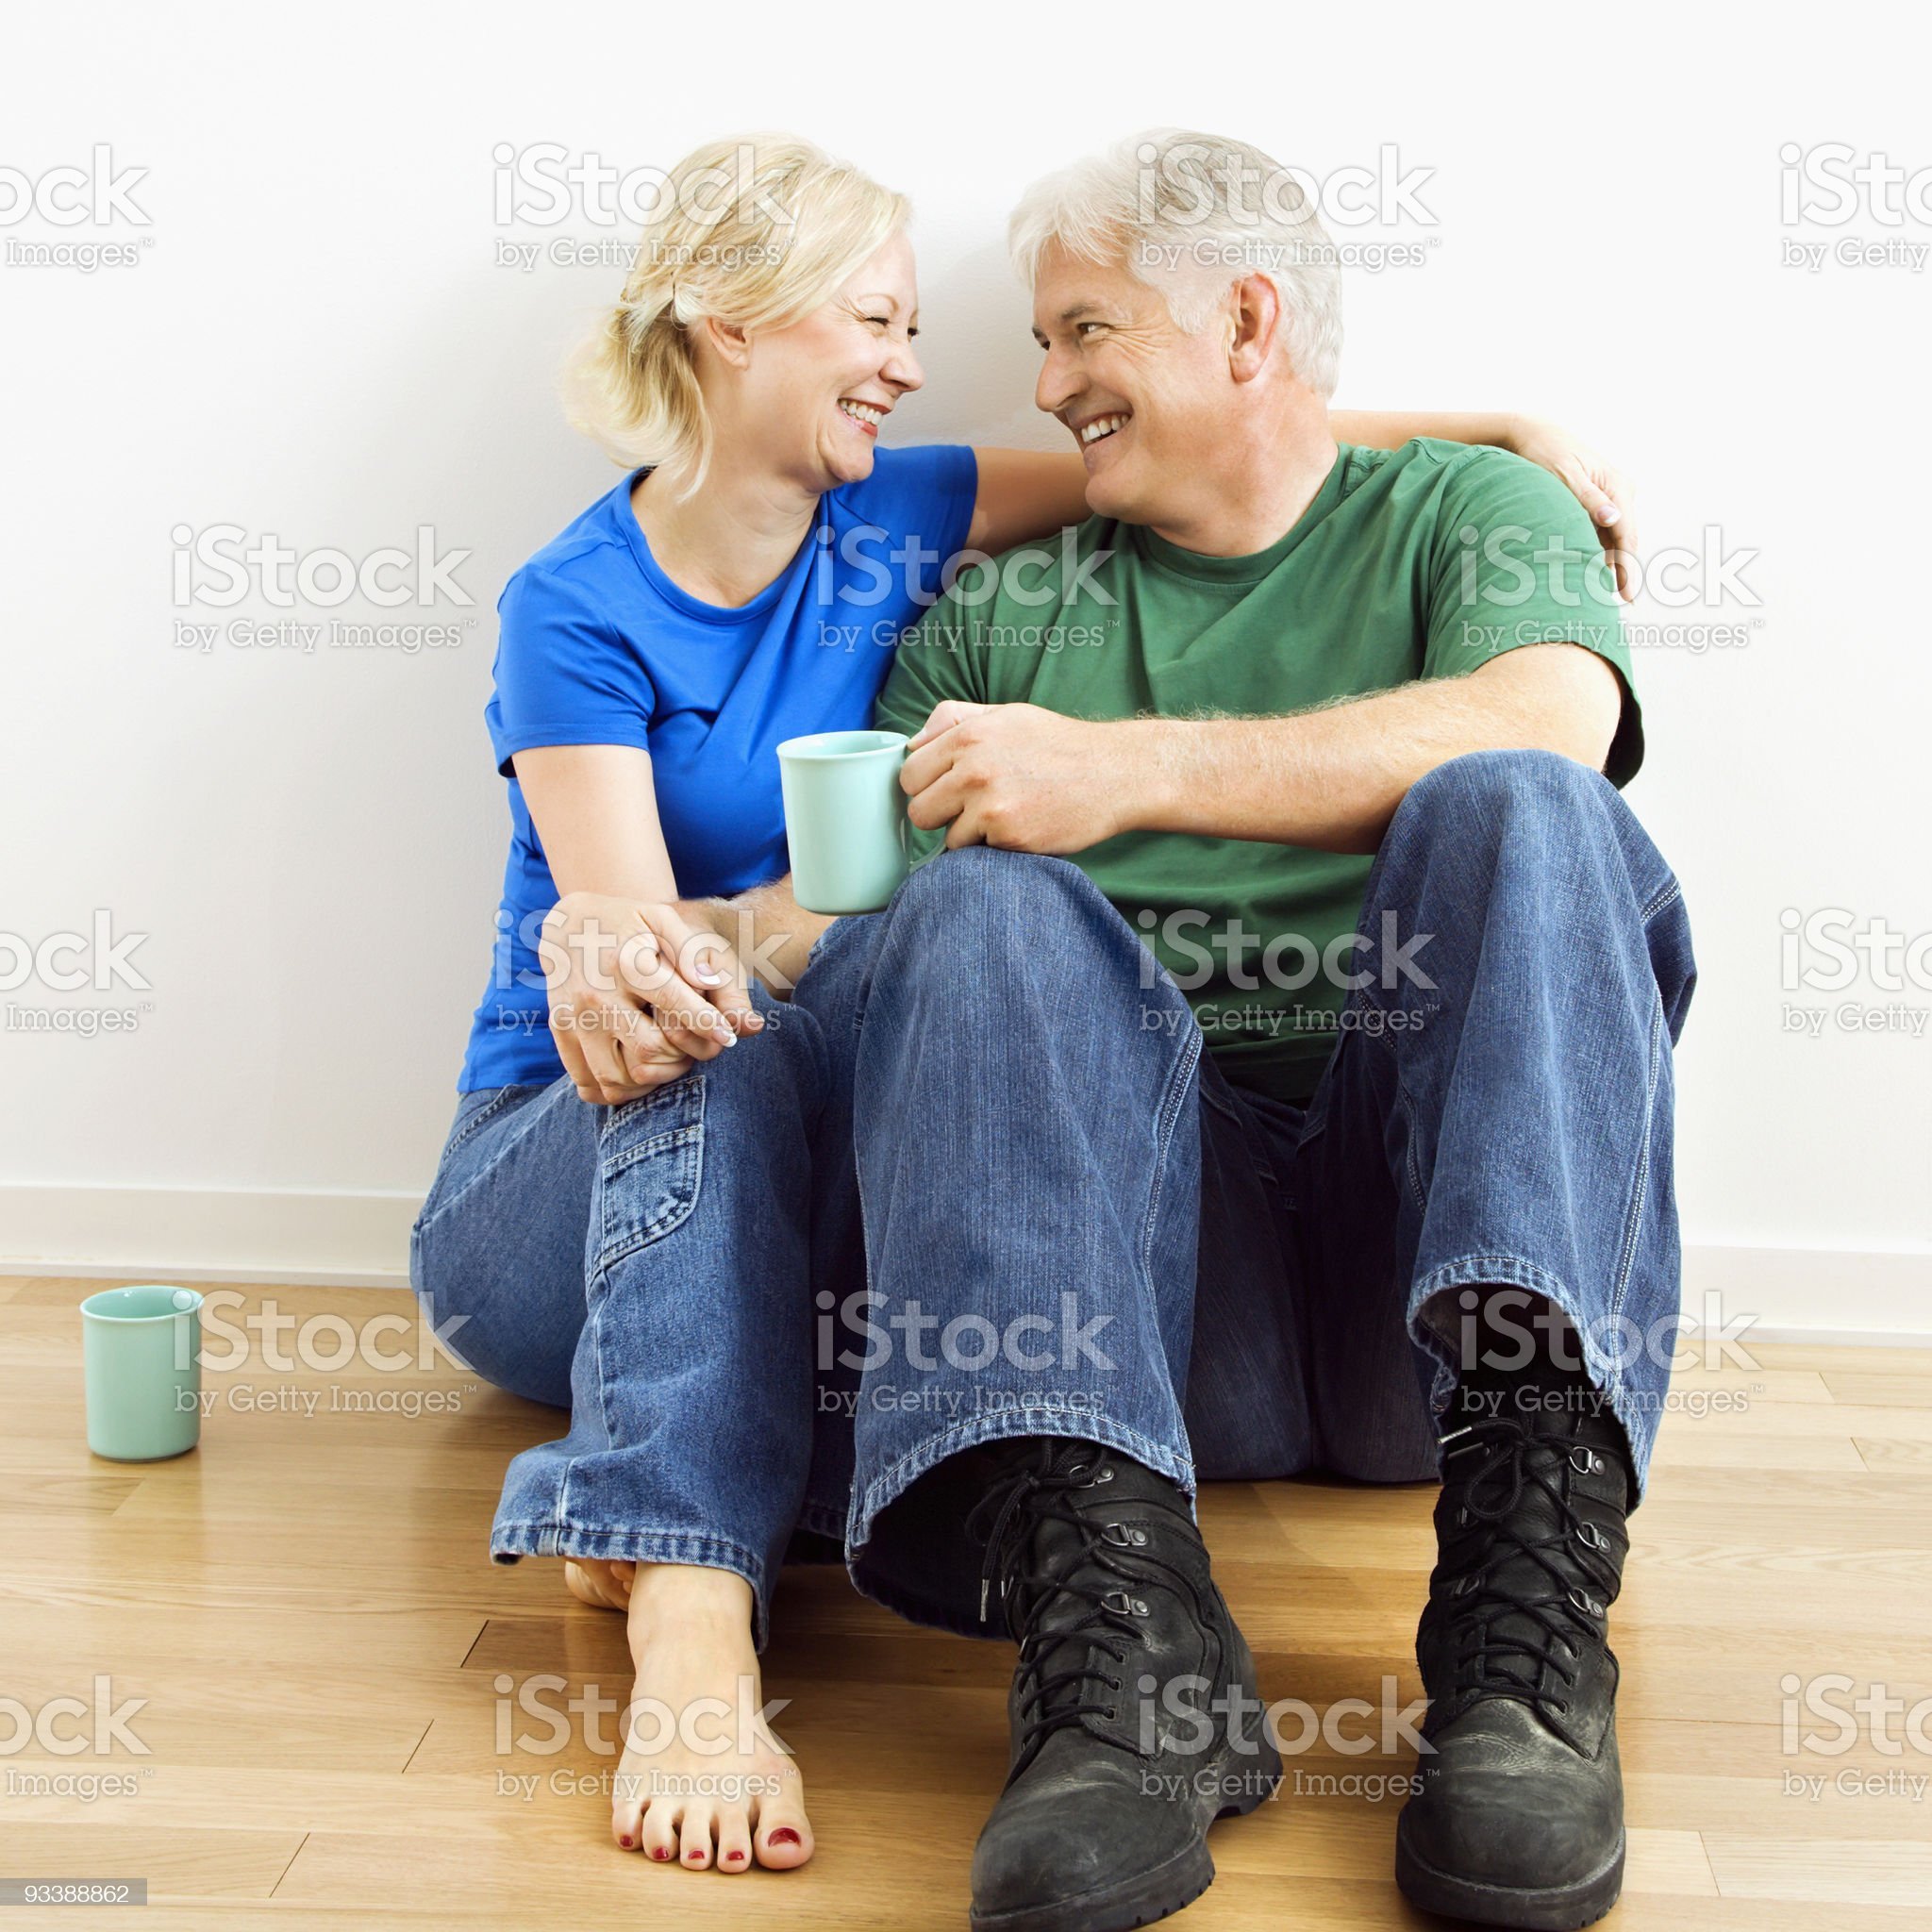 Couple enjoying coffee. royalty-free stock photo